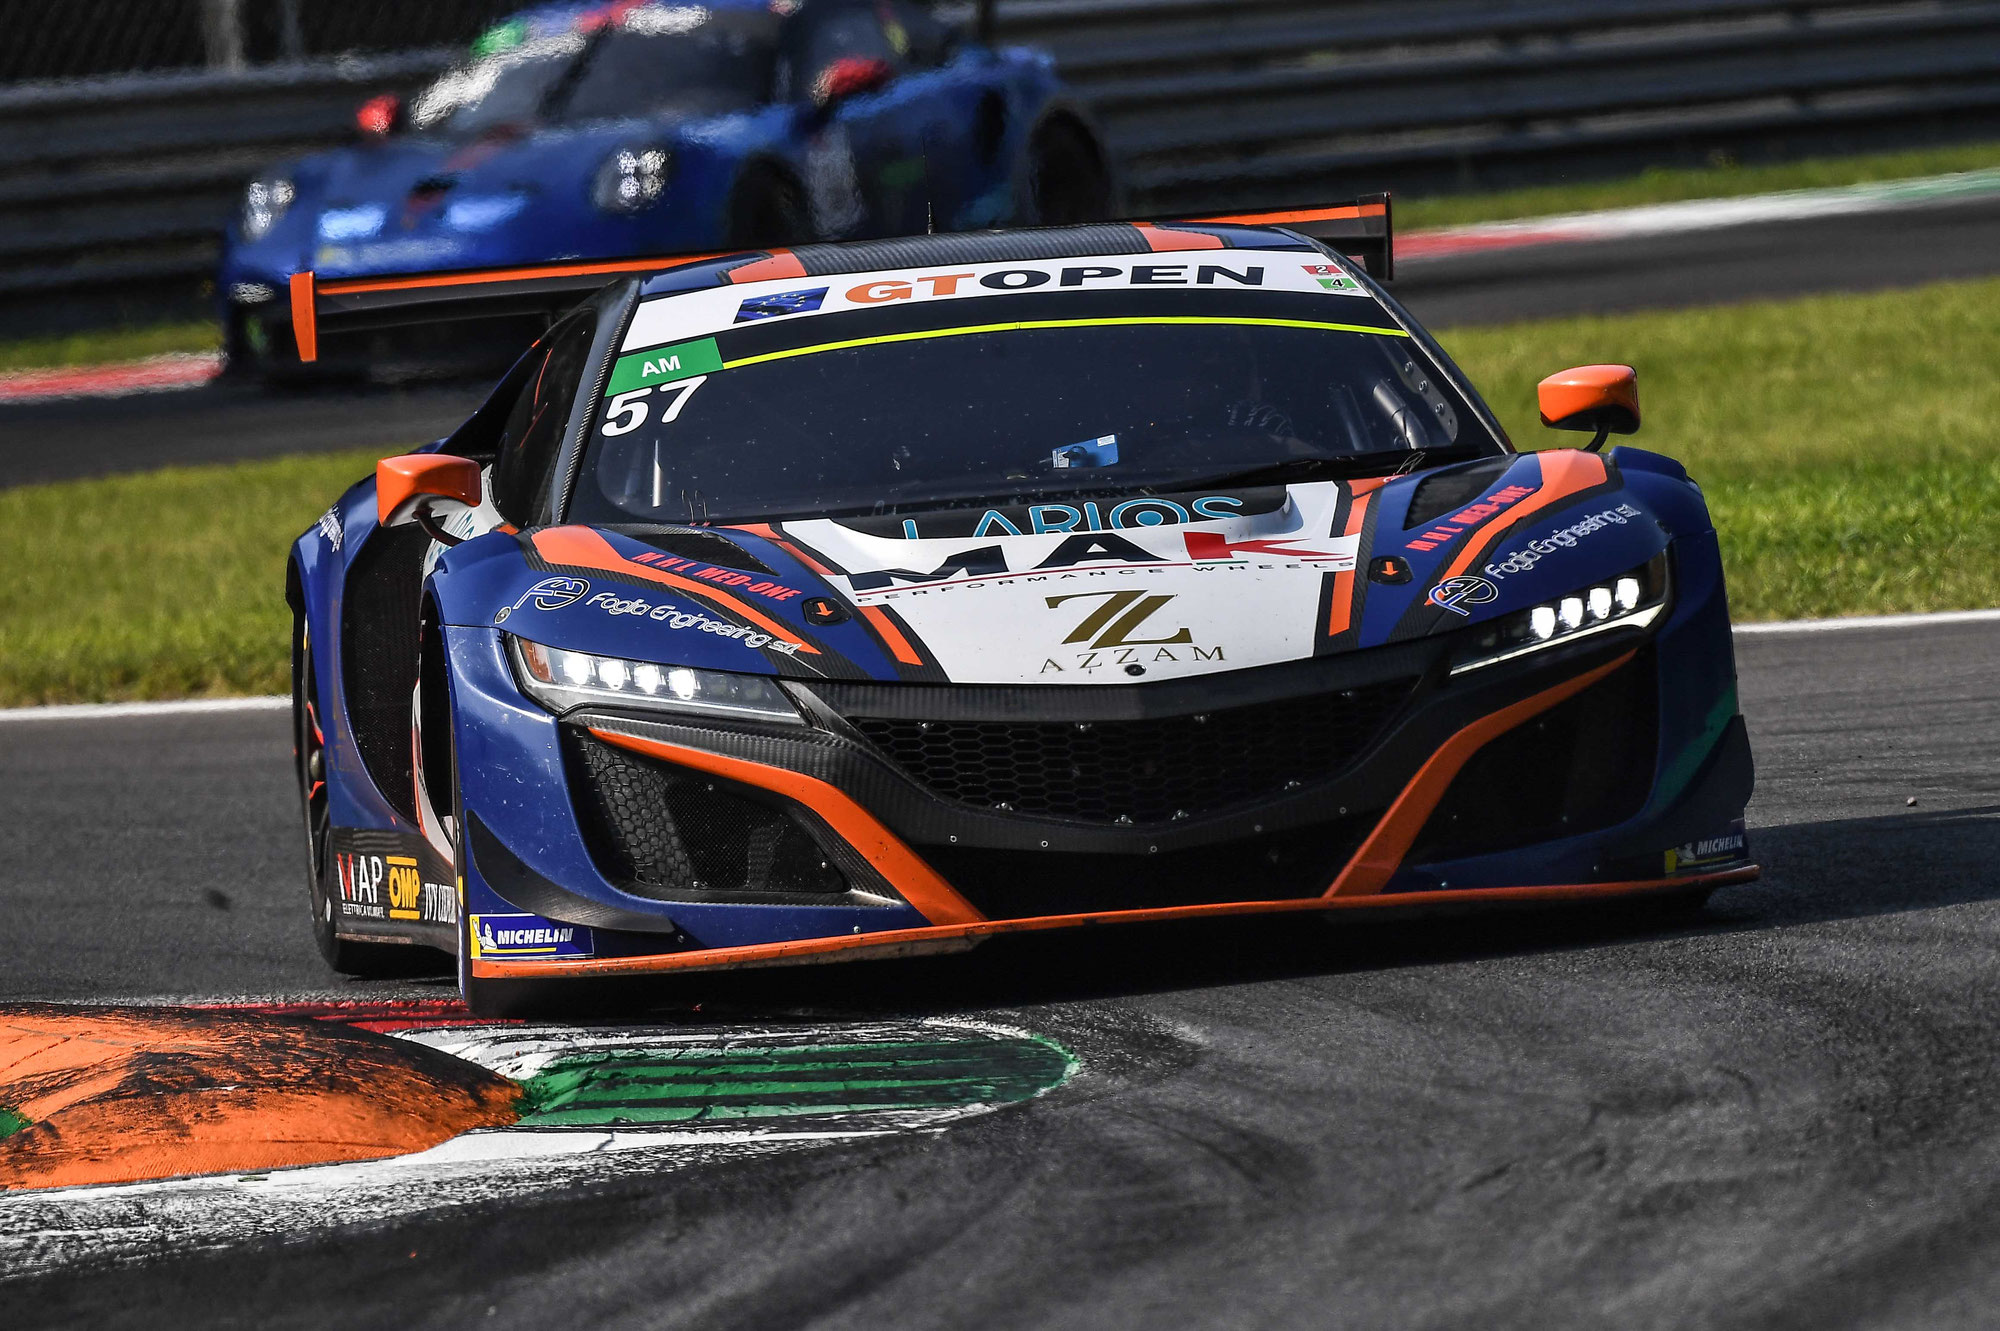 Nova Race startet in Barcelona erneut mit Lippi und Guidetti